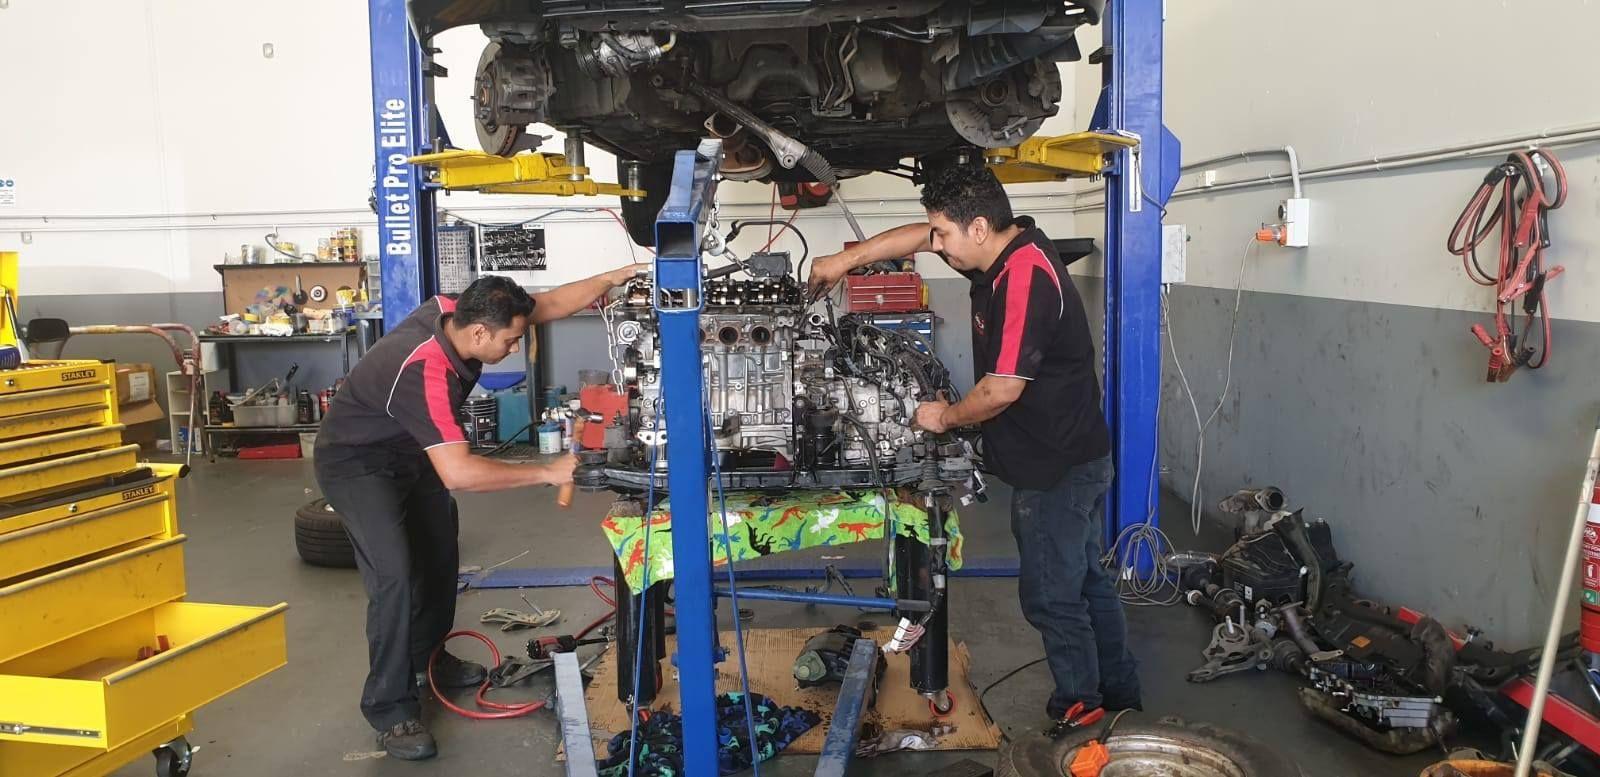 find accident repair near me in sydney Car repair